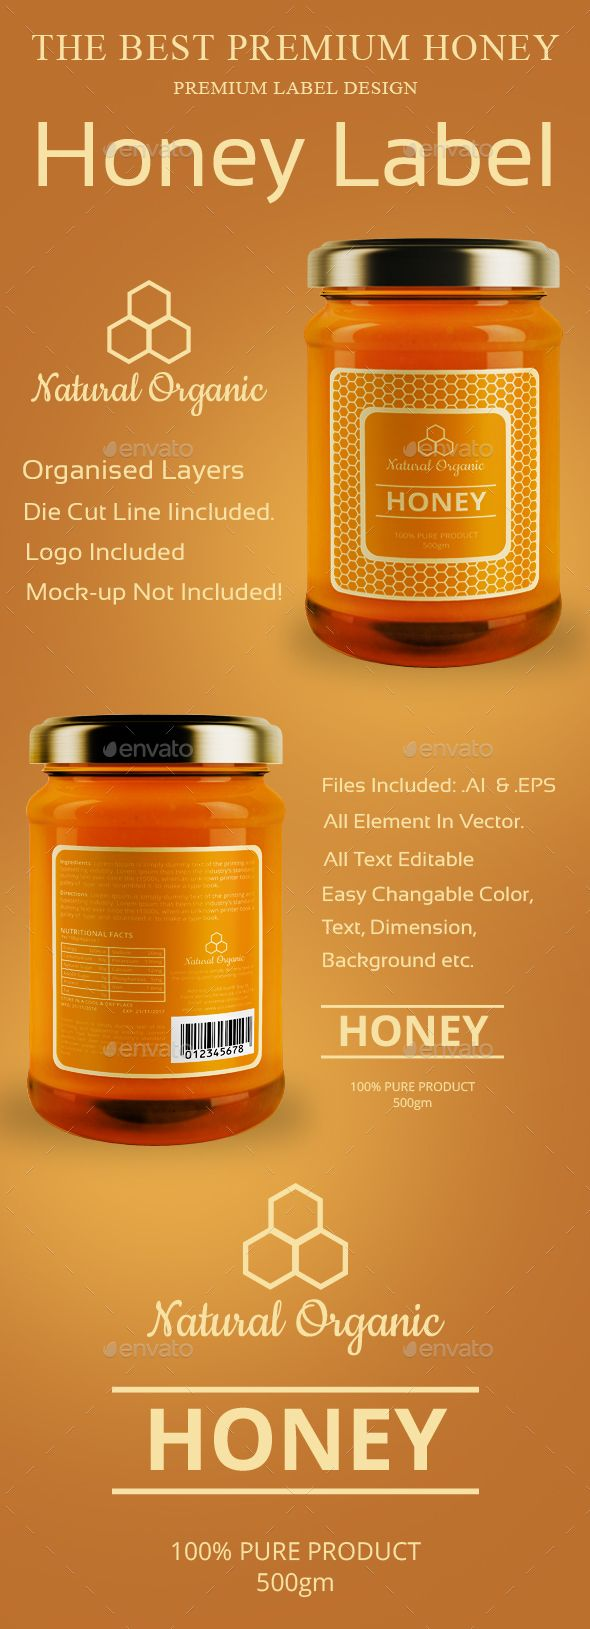 Honey Label Design Template Vector EPS, AI Illustrator